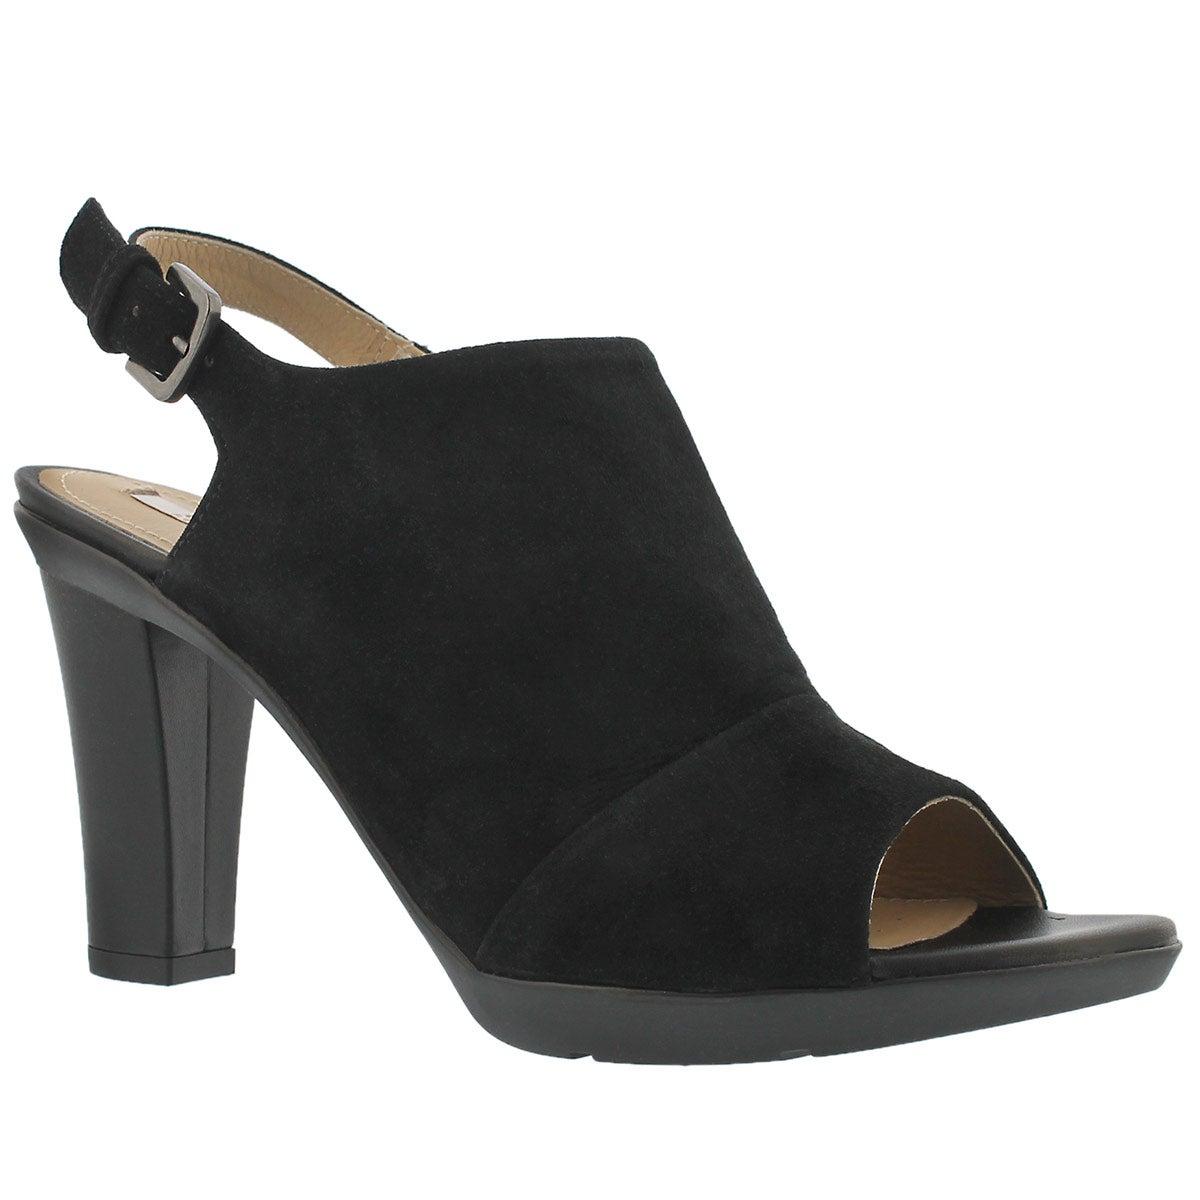 Women's JADALIS black dress sandals